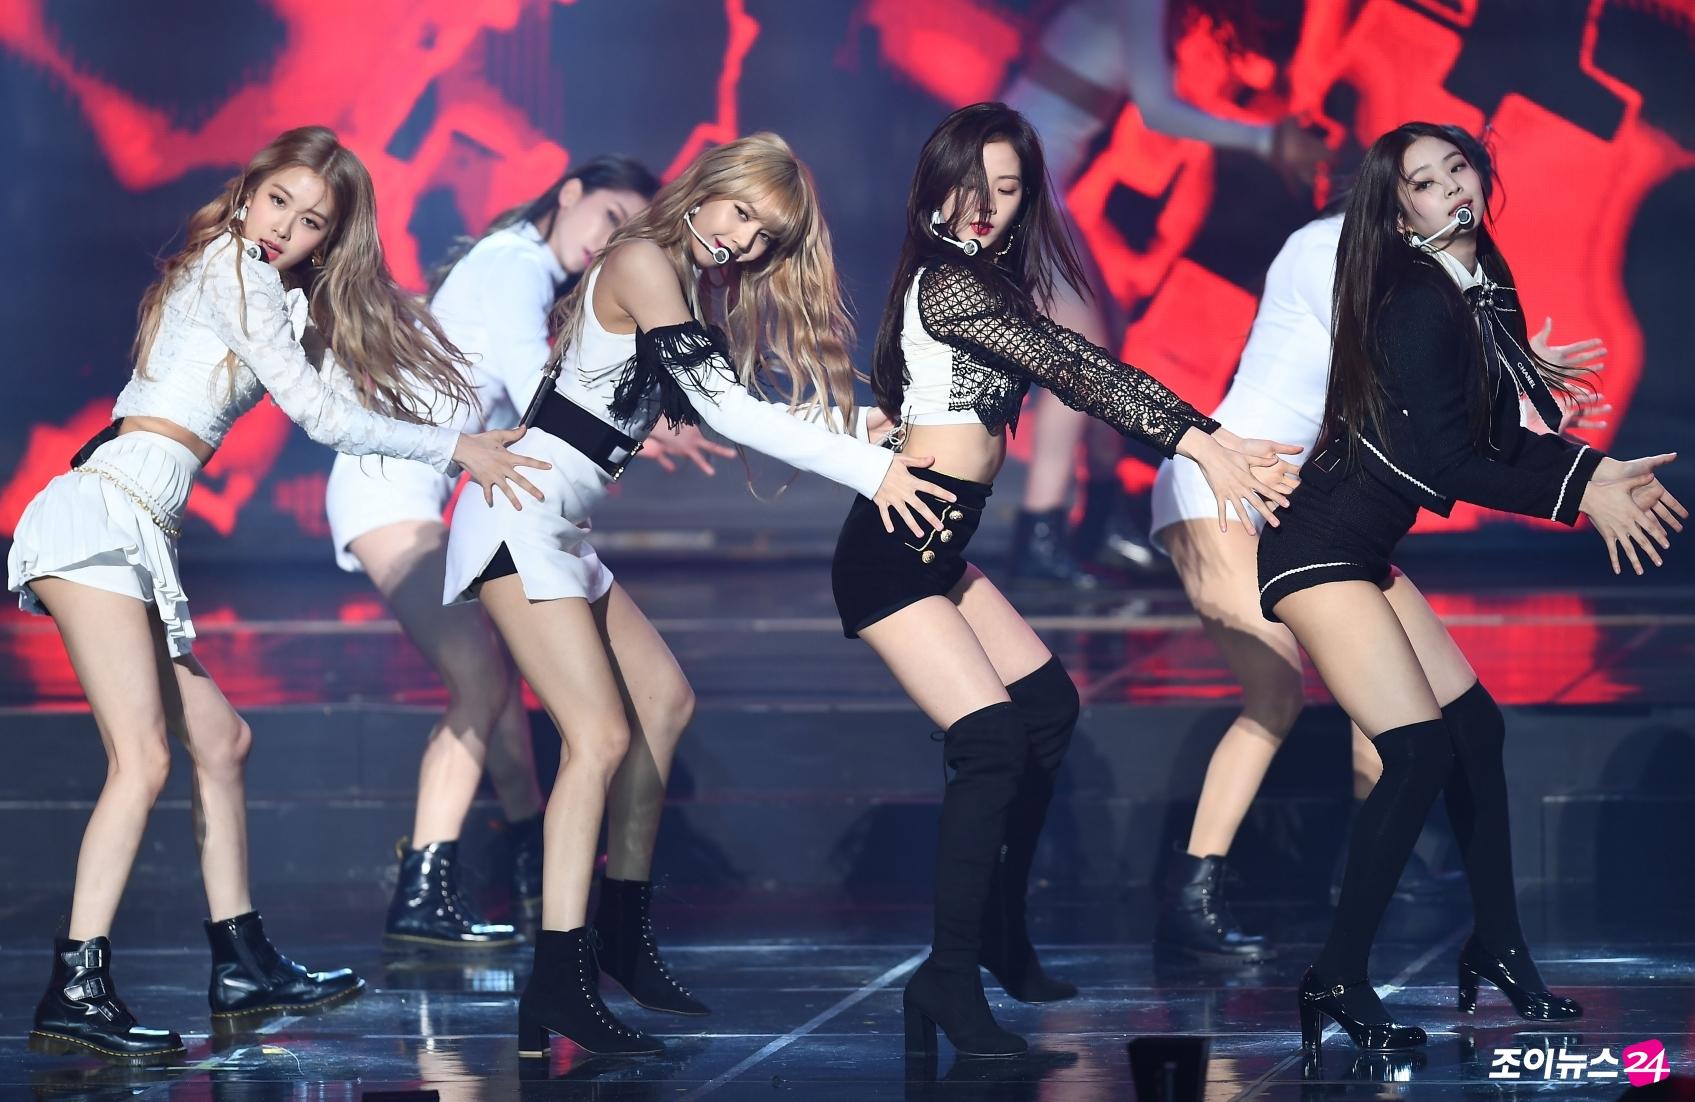 22-BLACKPINK Gaon Chart Music Awards 2019